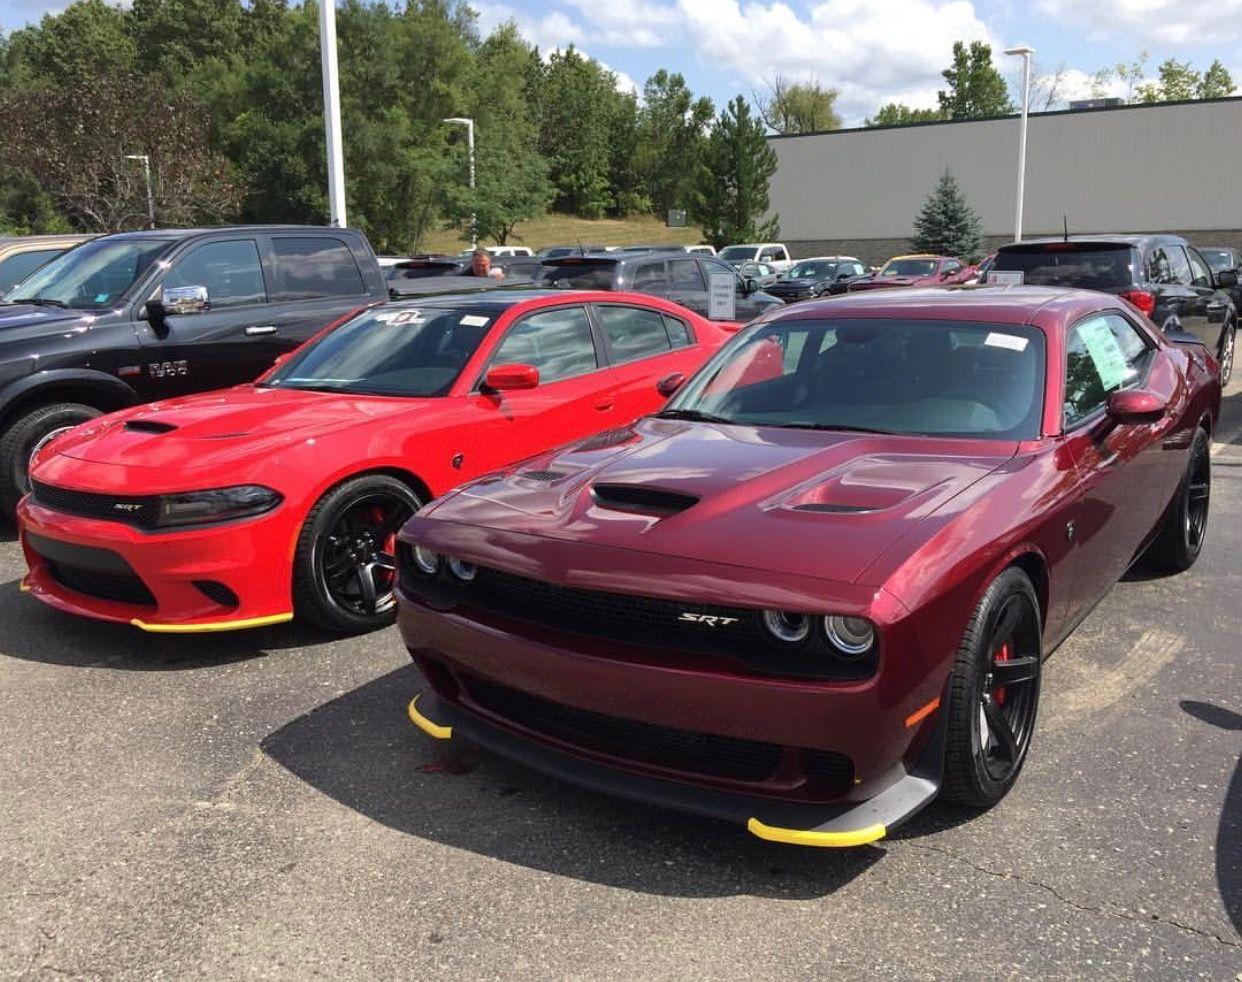 A Dodge Challenger Srt Hellcat Painted In Octane Red And A Dodge Charger Srt Hellcat Painted In T Dodge Charger Srt Dodge Challenger Srt Challenger Srt Hellcat